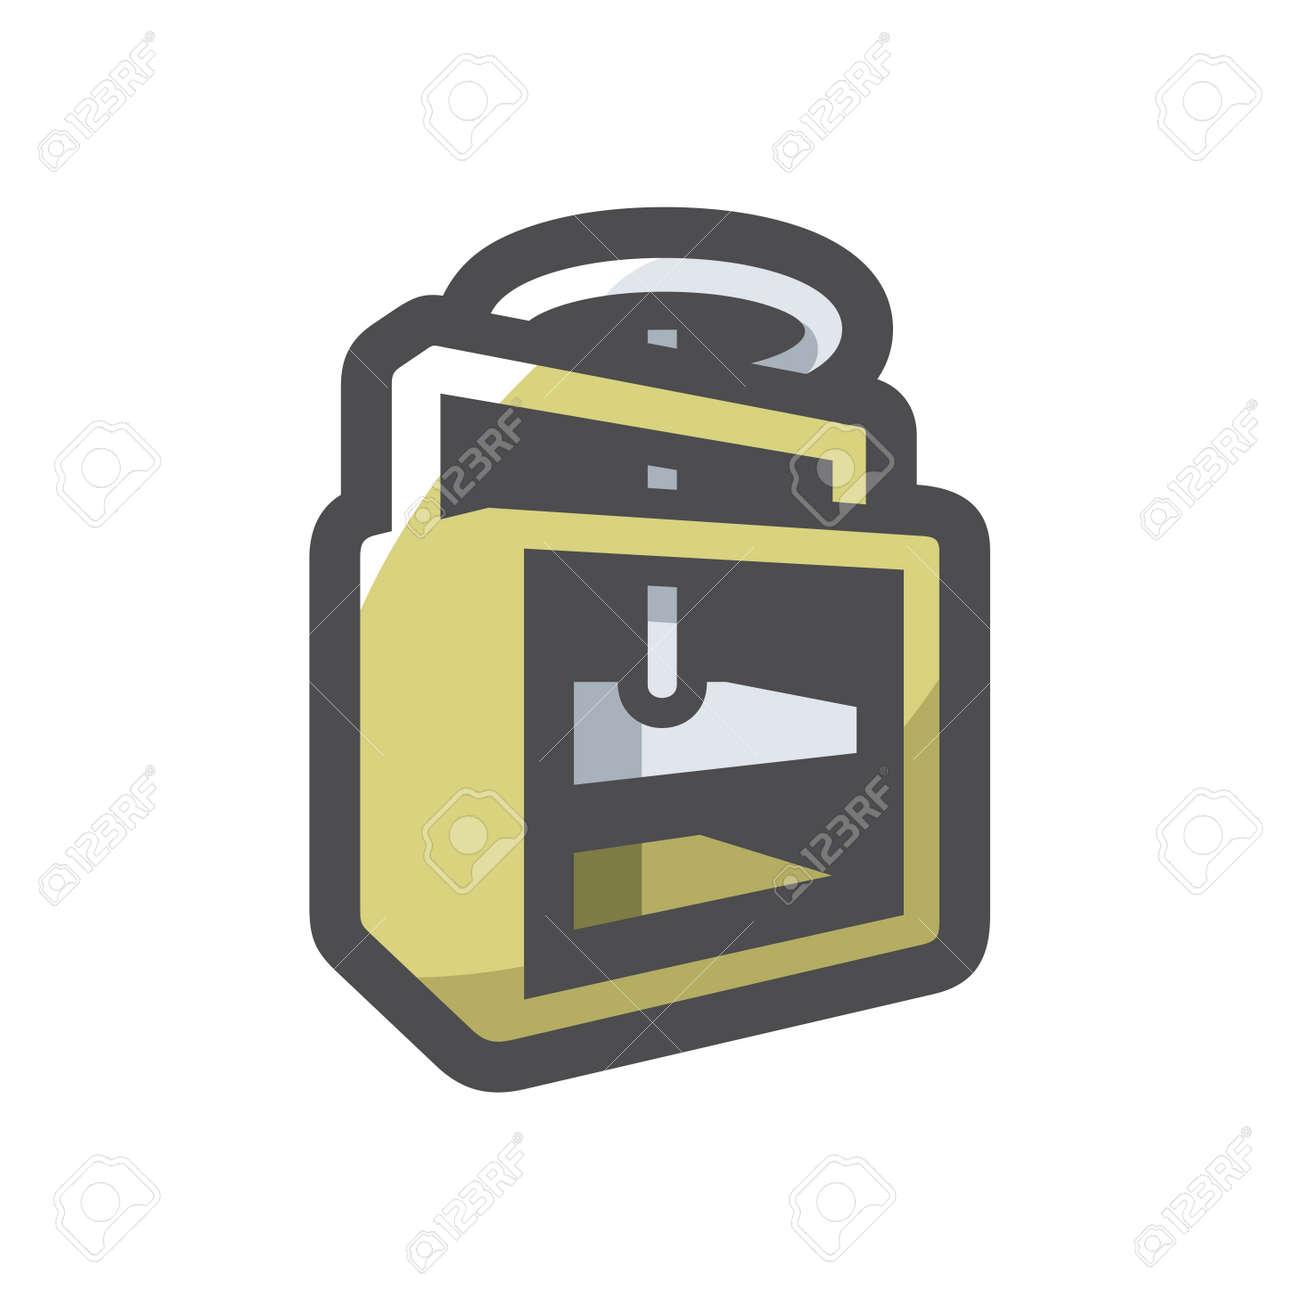 Press waste paper Vector icon Cartoon illustration - 169914199